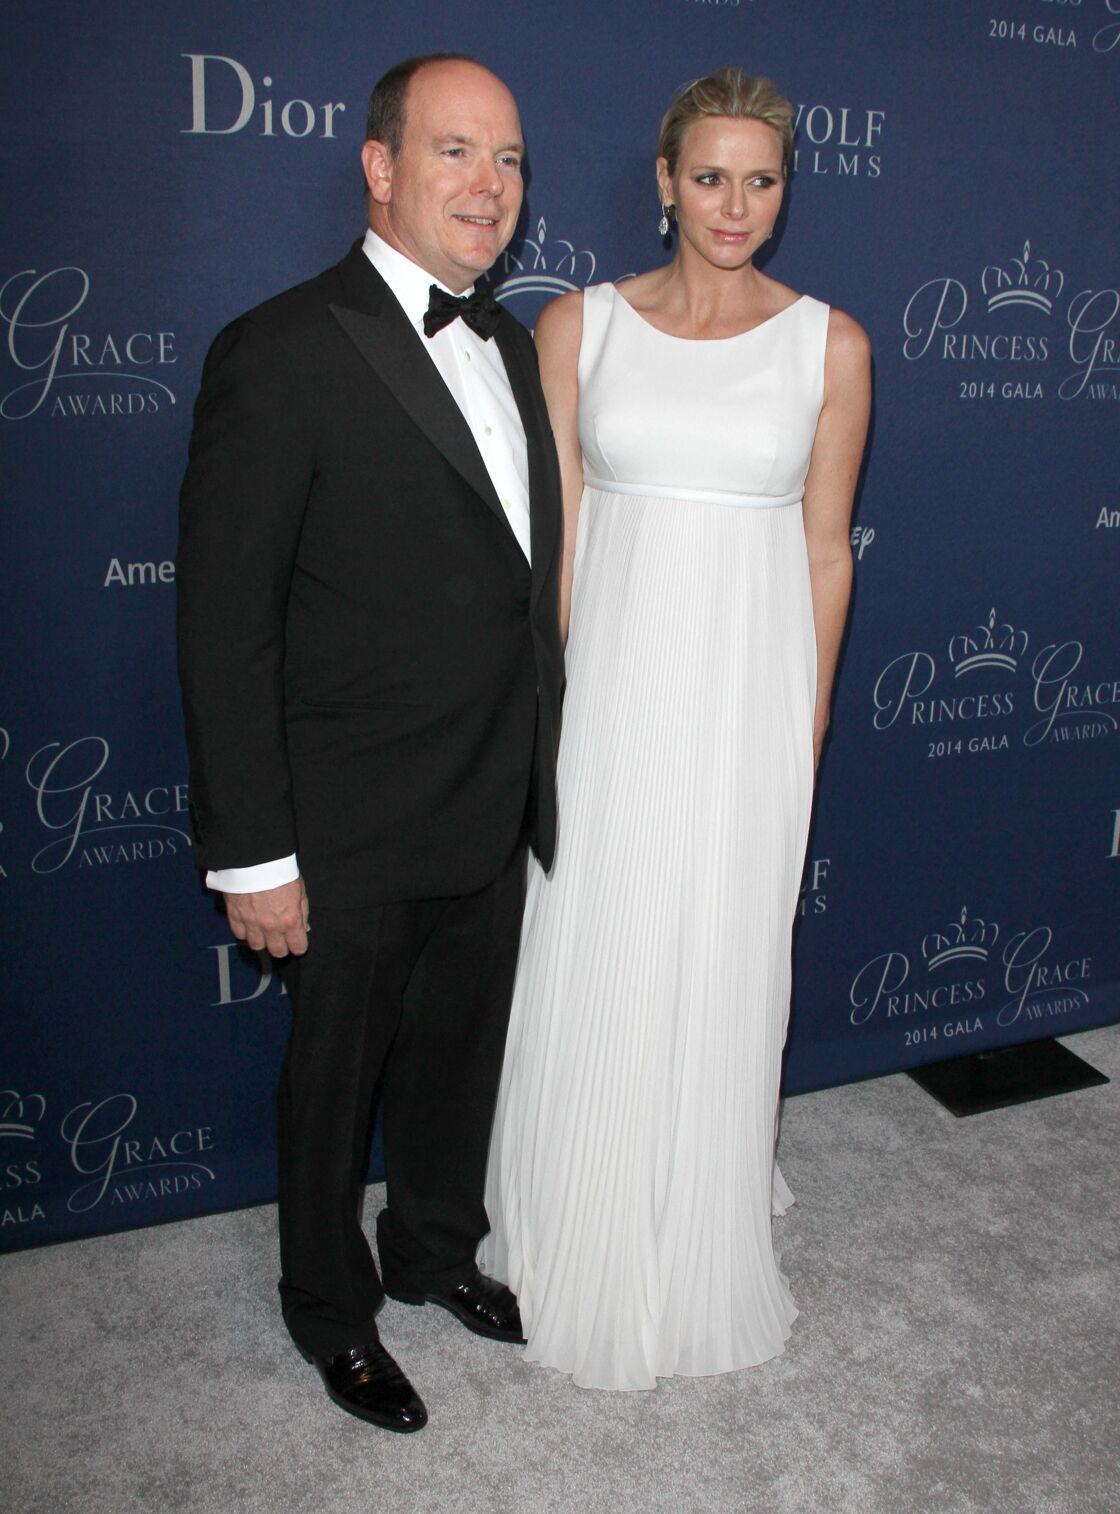 Charlene de Monaco en robe longue blanche taille empire lors de sa grossesse